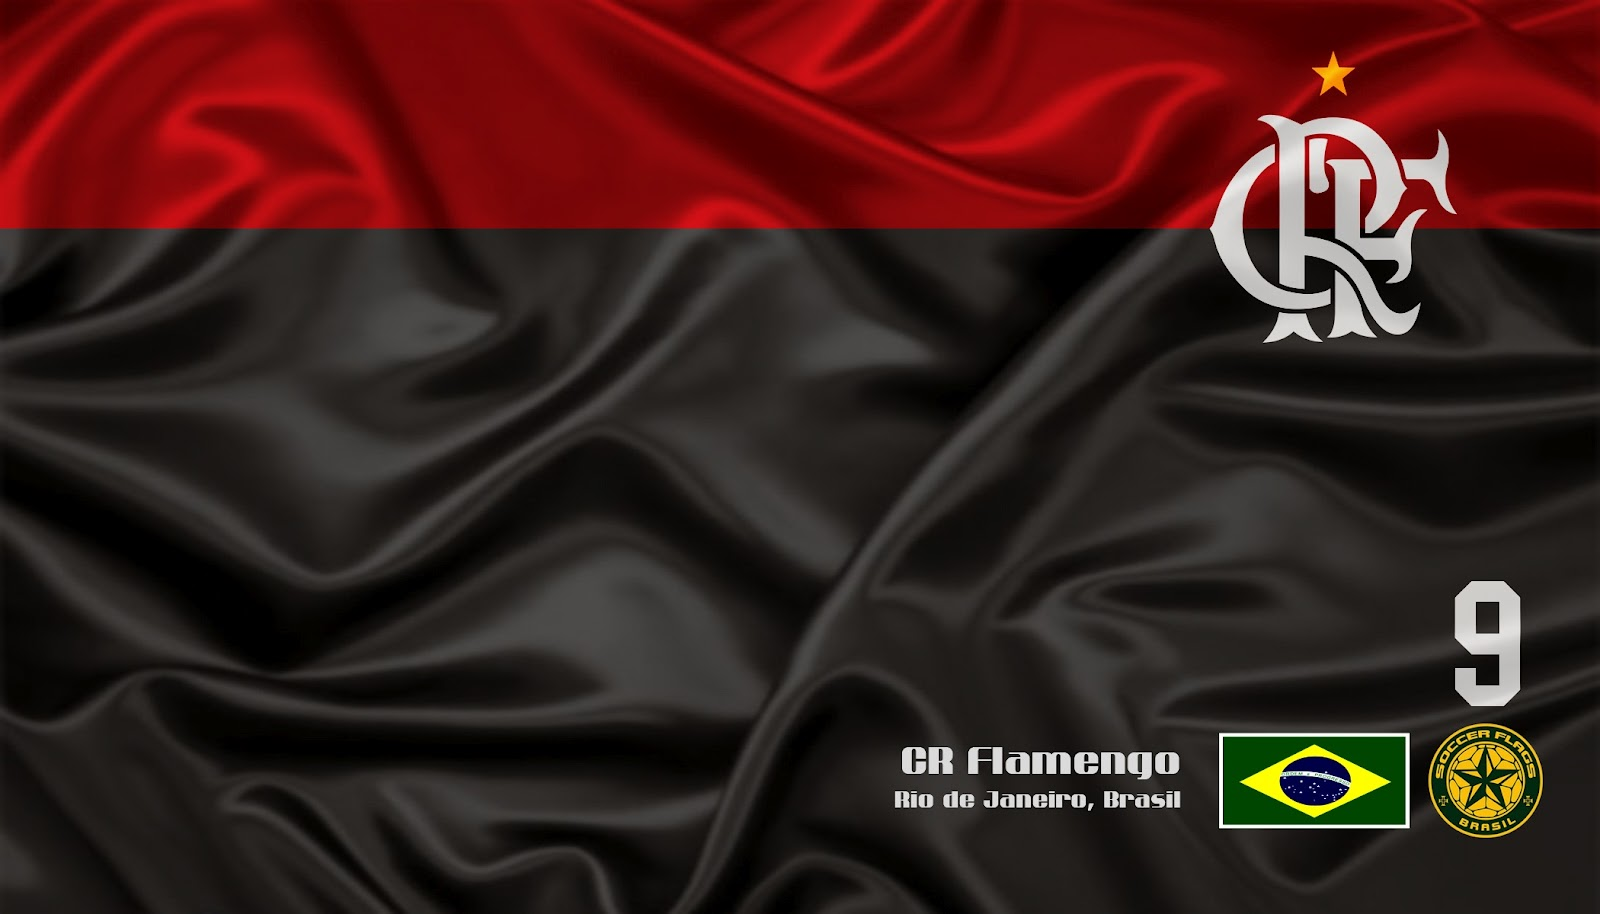 http://2.bp.blogspot.com/-mi0hrvUYx9M/UCpndUQ9EbI/AAAAAAAACcI/BNdJfe-k53c/s1600/Flamengo+(11).jpg